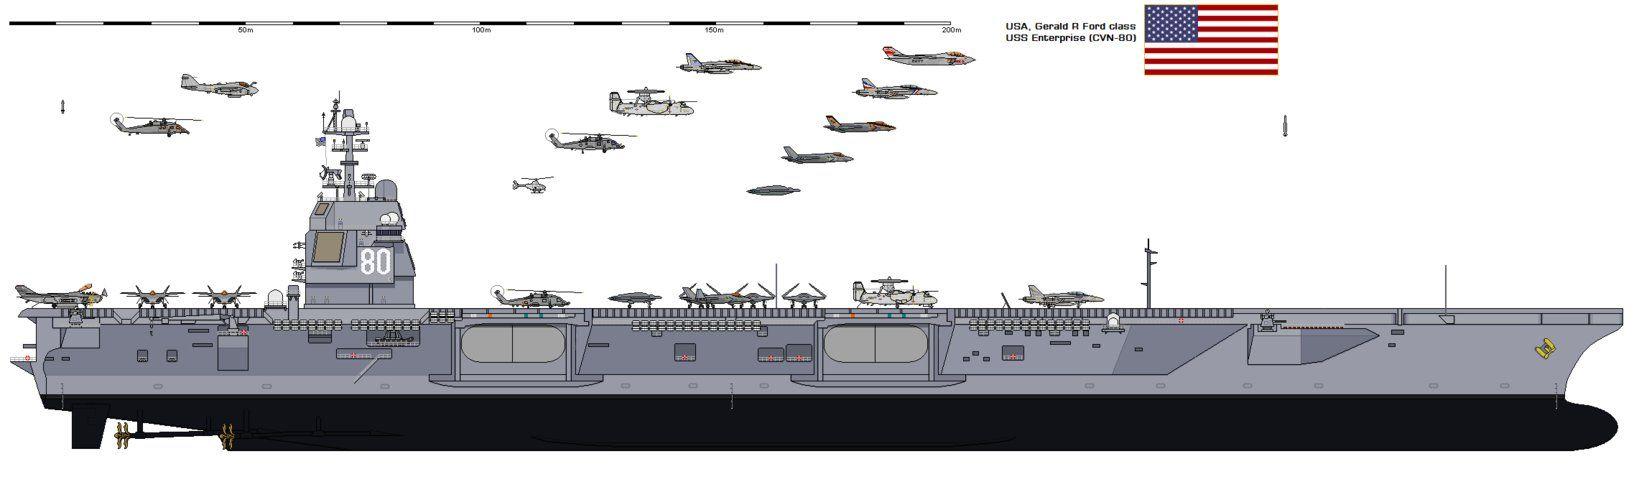 CVN-80 CVN-80 USS Enterprise by SILVER-70CHEV on DeviantArt